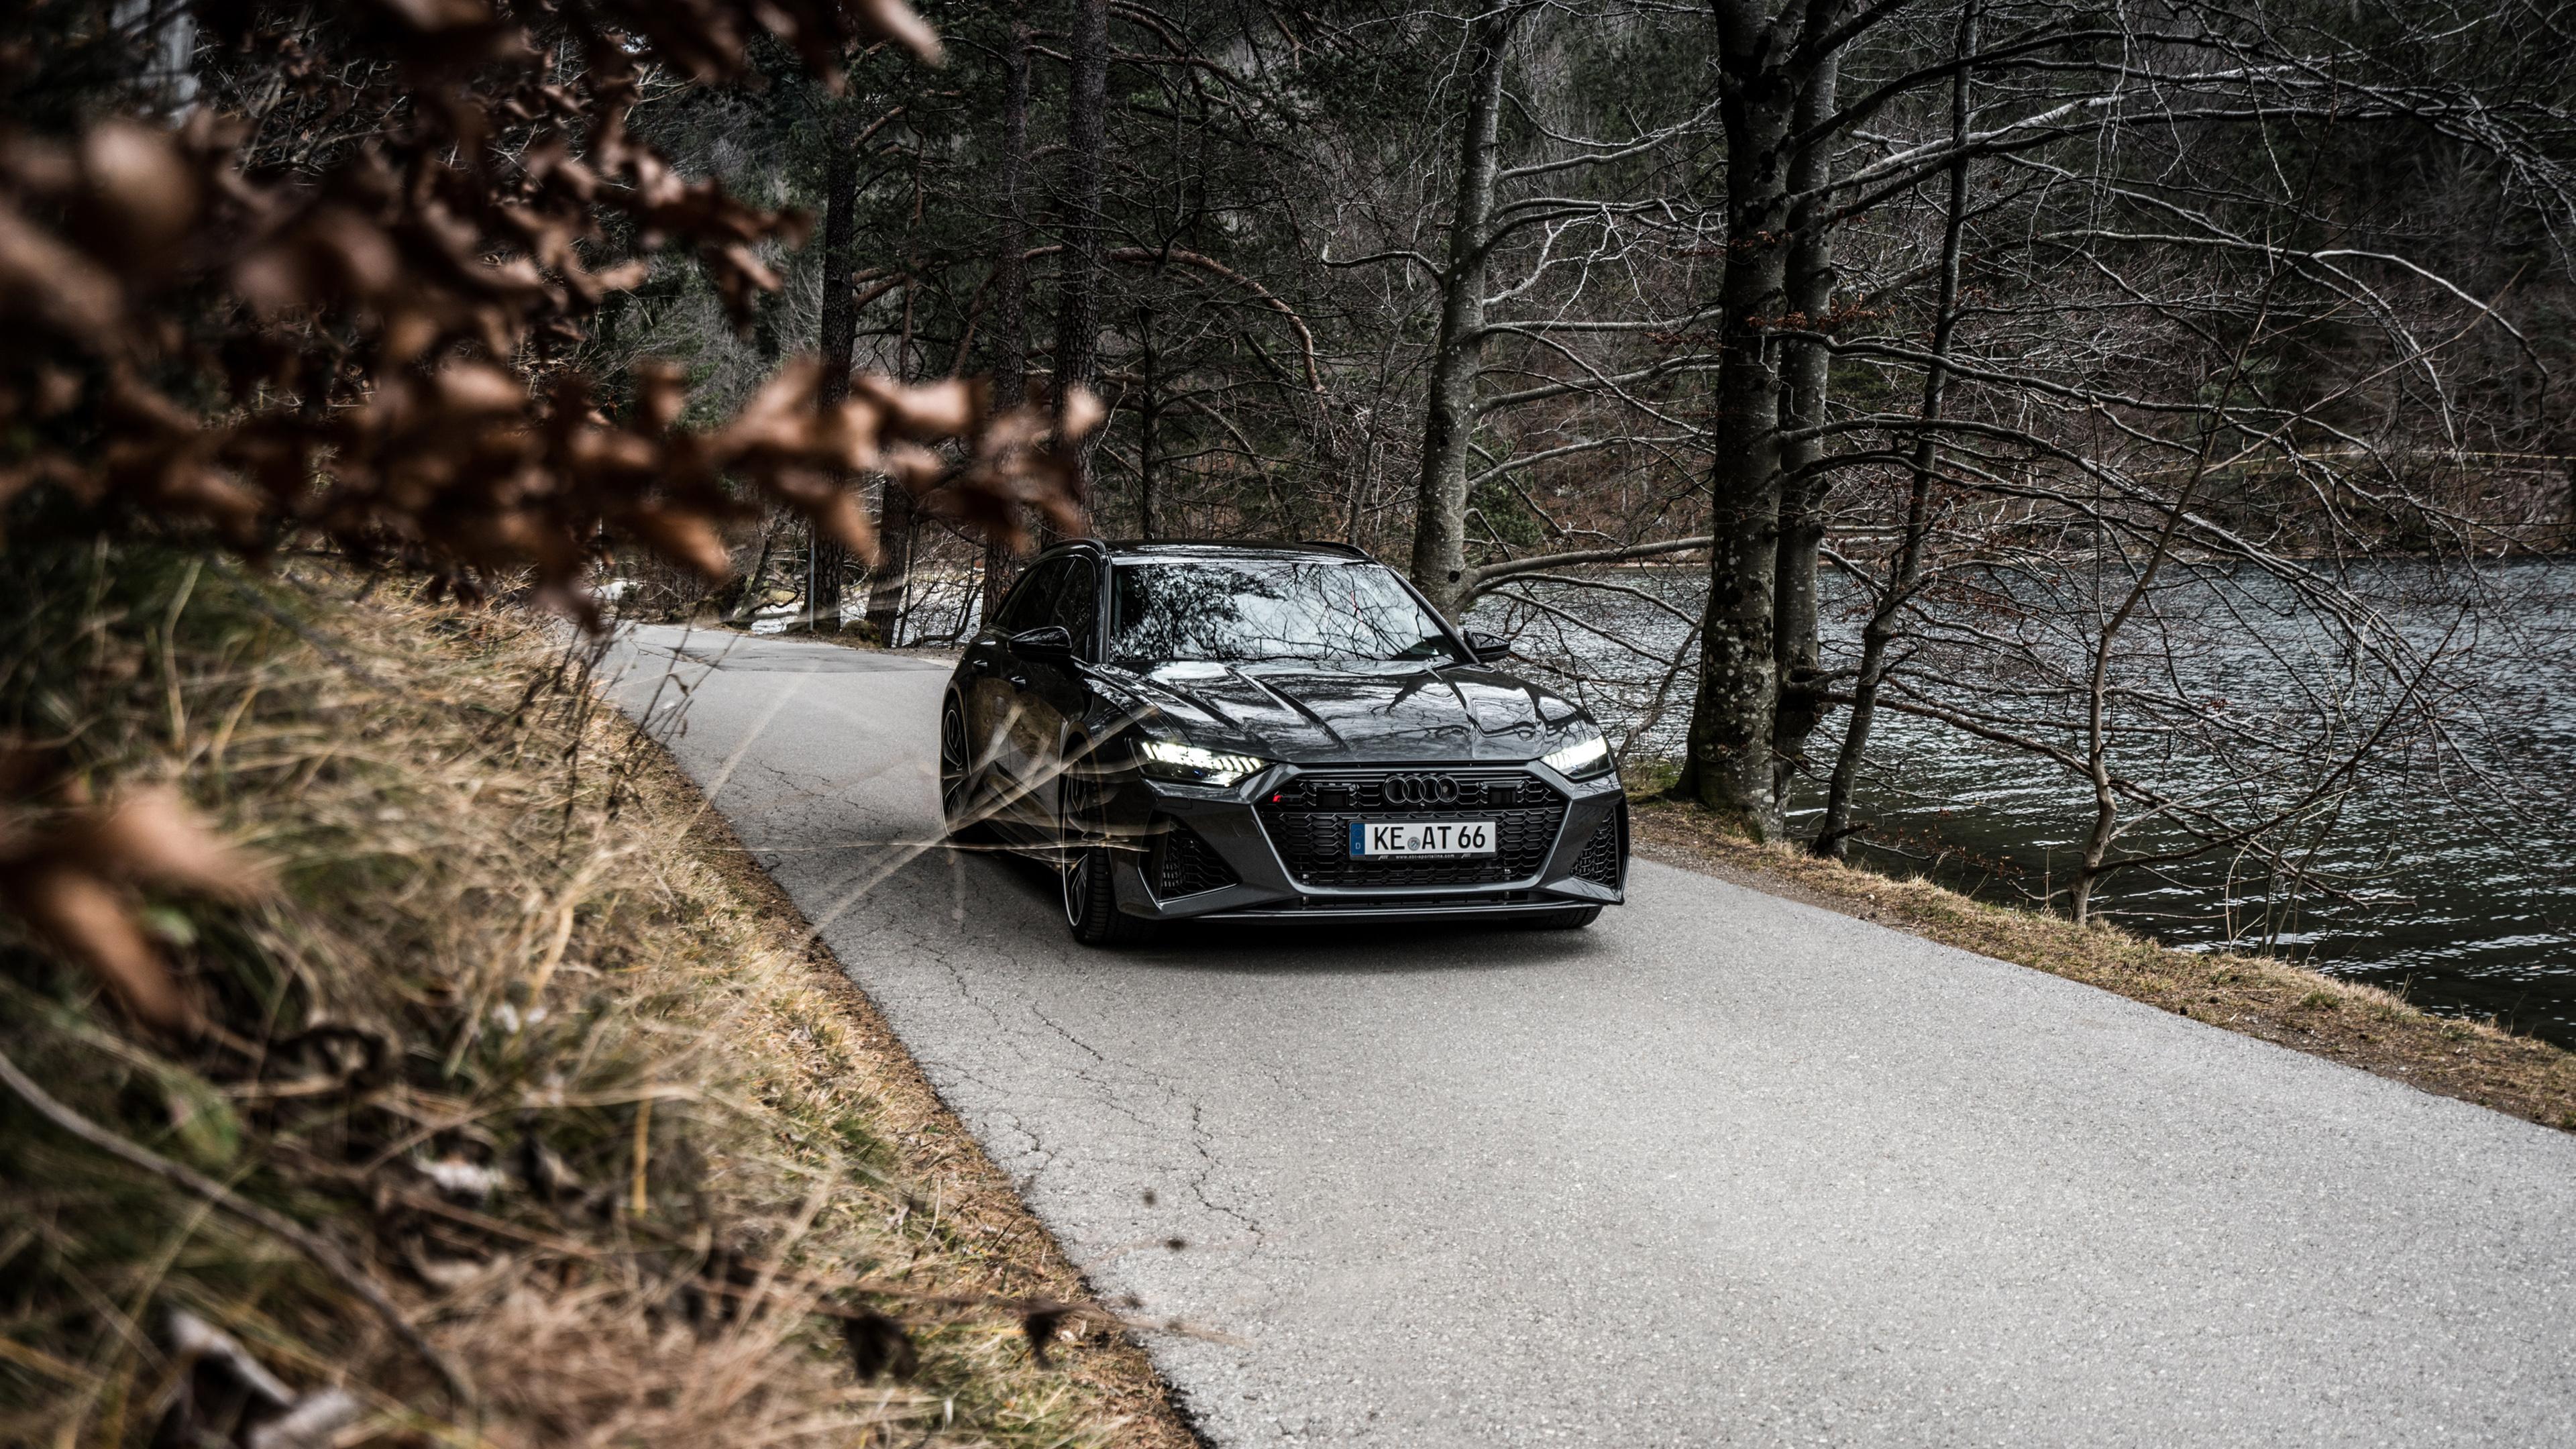 Abt Audi Rs 6 Avant 2020 4k Wallpaper Hd Car Wallpapers Id 14165